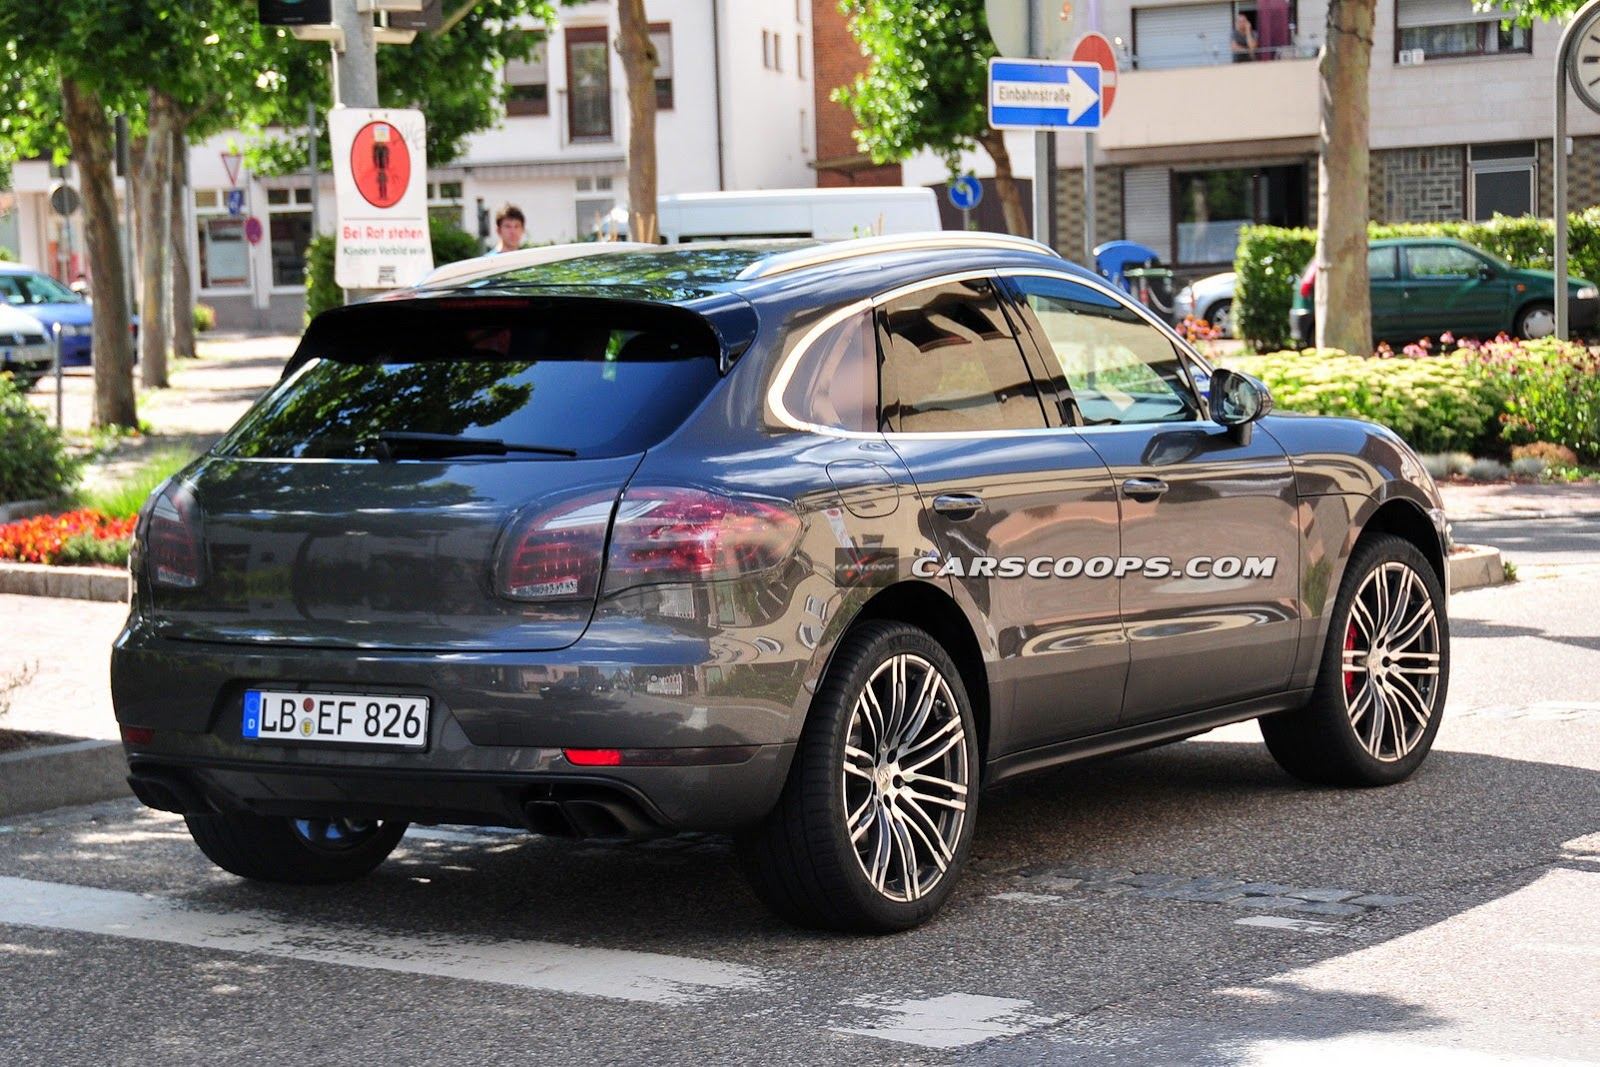 Spyshots 2015 Porsche Macan Turbo Snapped Undisguised Gtspirit